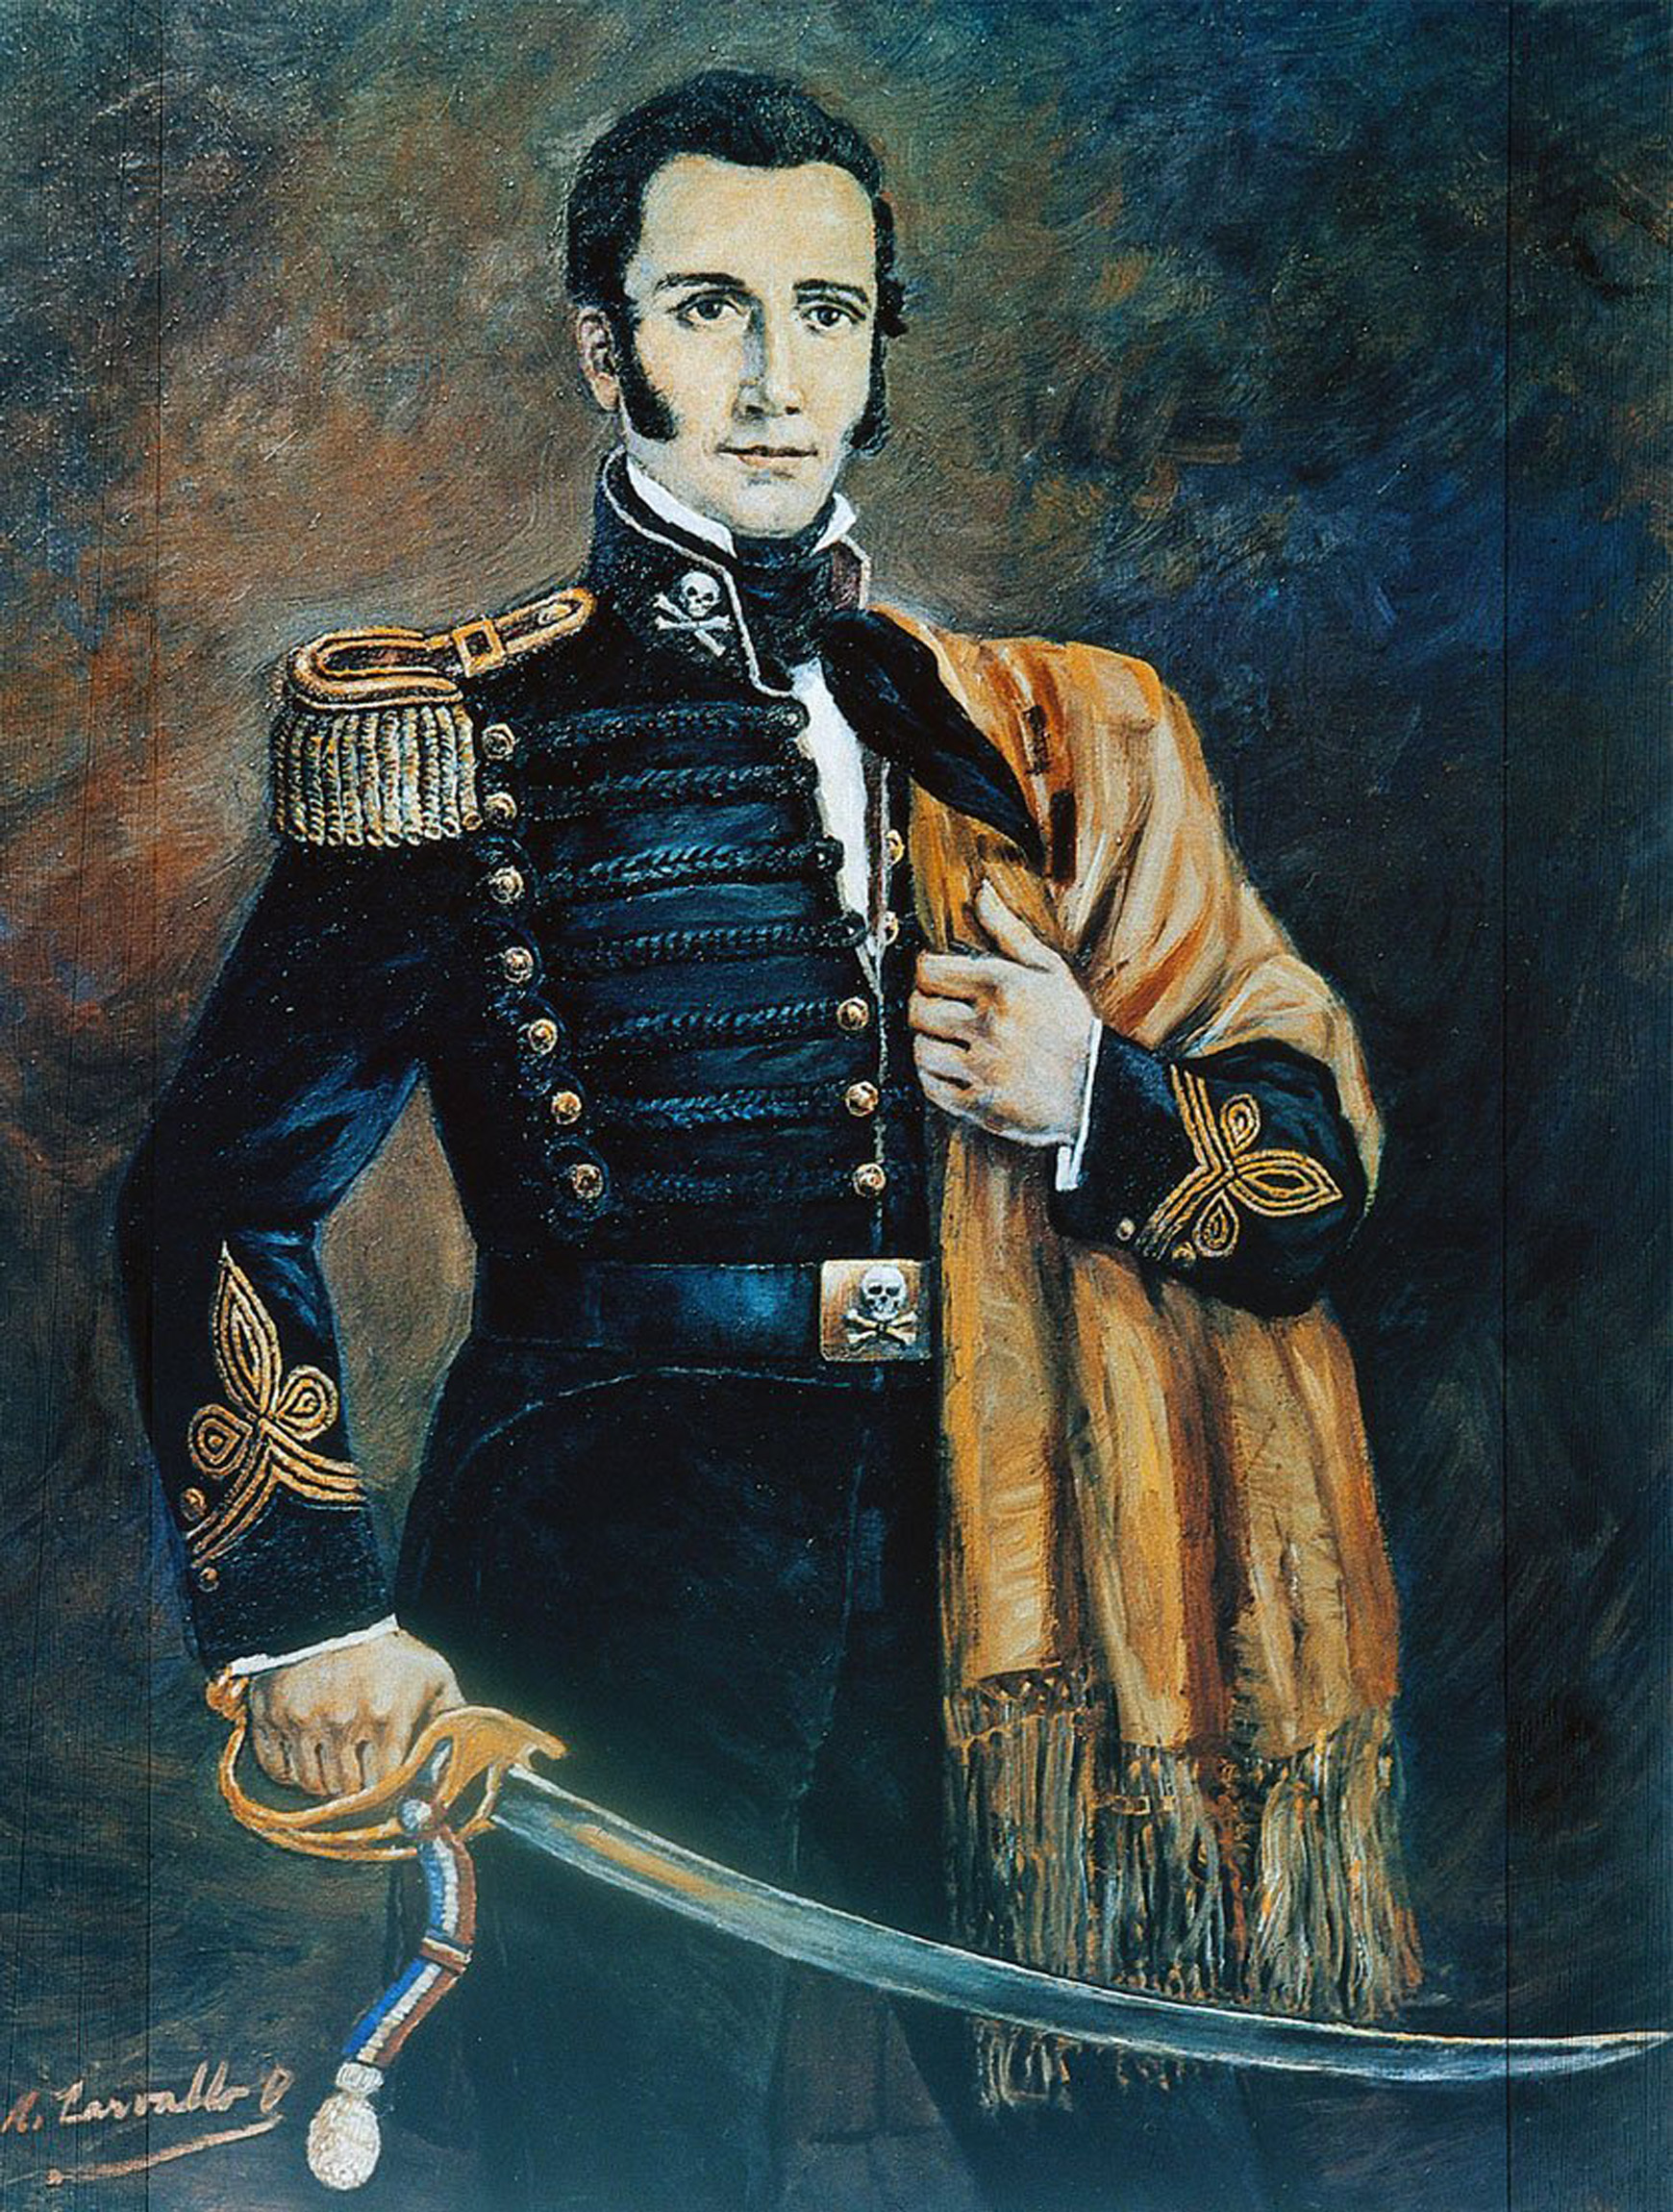 Prendas emblemáticas: La chaqueta militar tipo Hussar